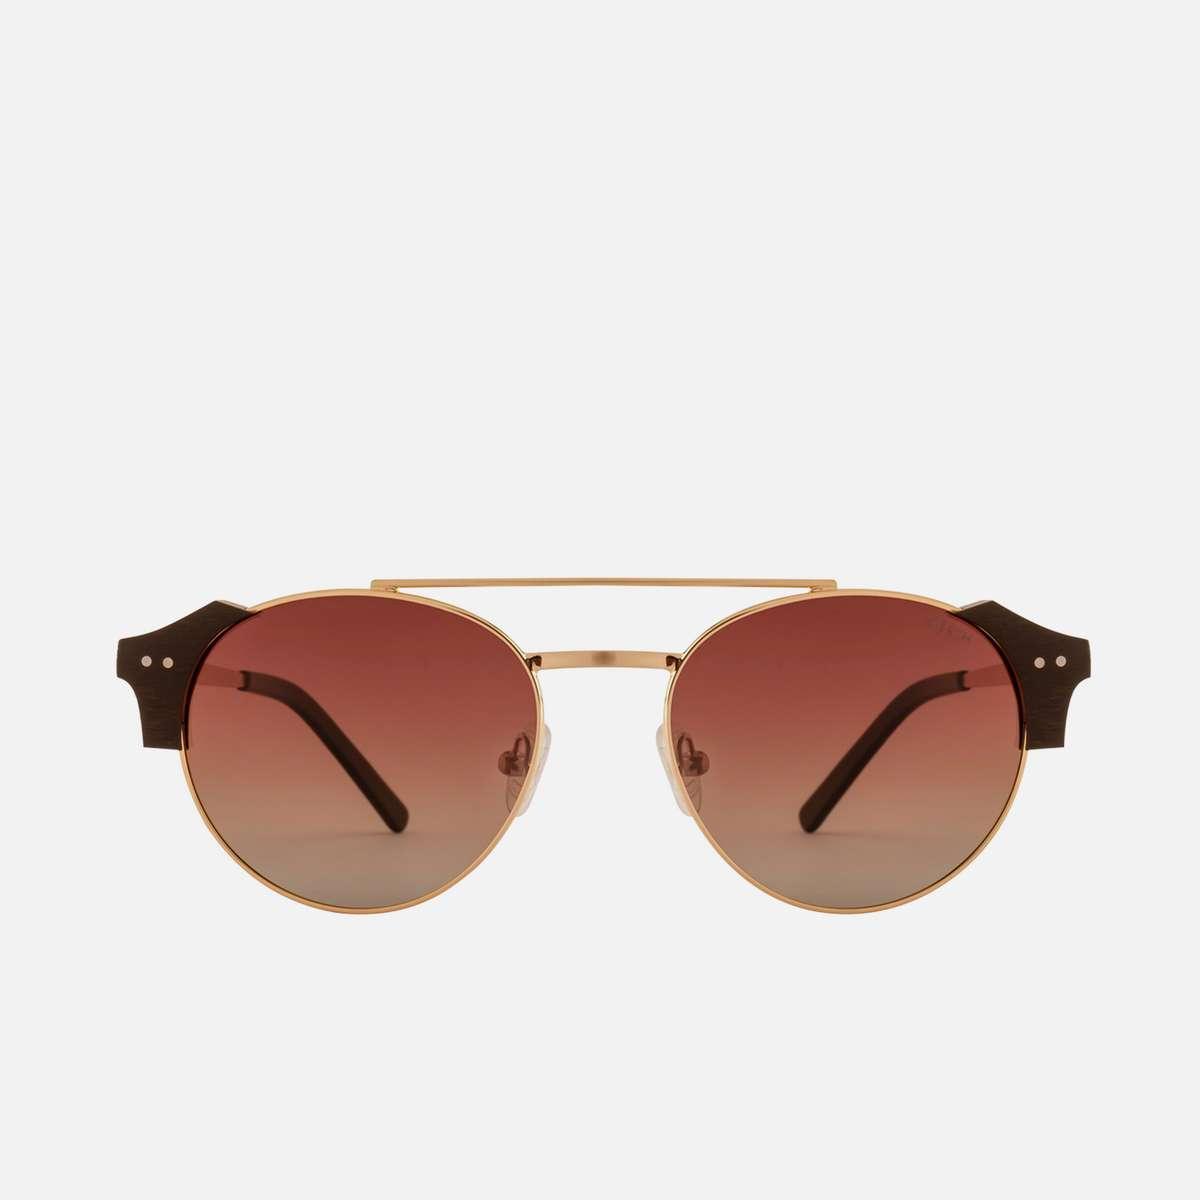 1.KOSCH ELEMENTE Women UV-Protected Oval Sunglasses- 1003-C2